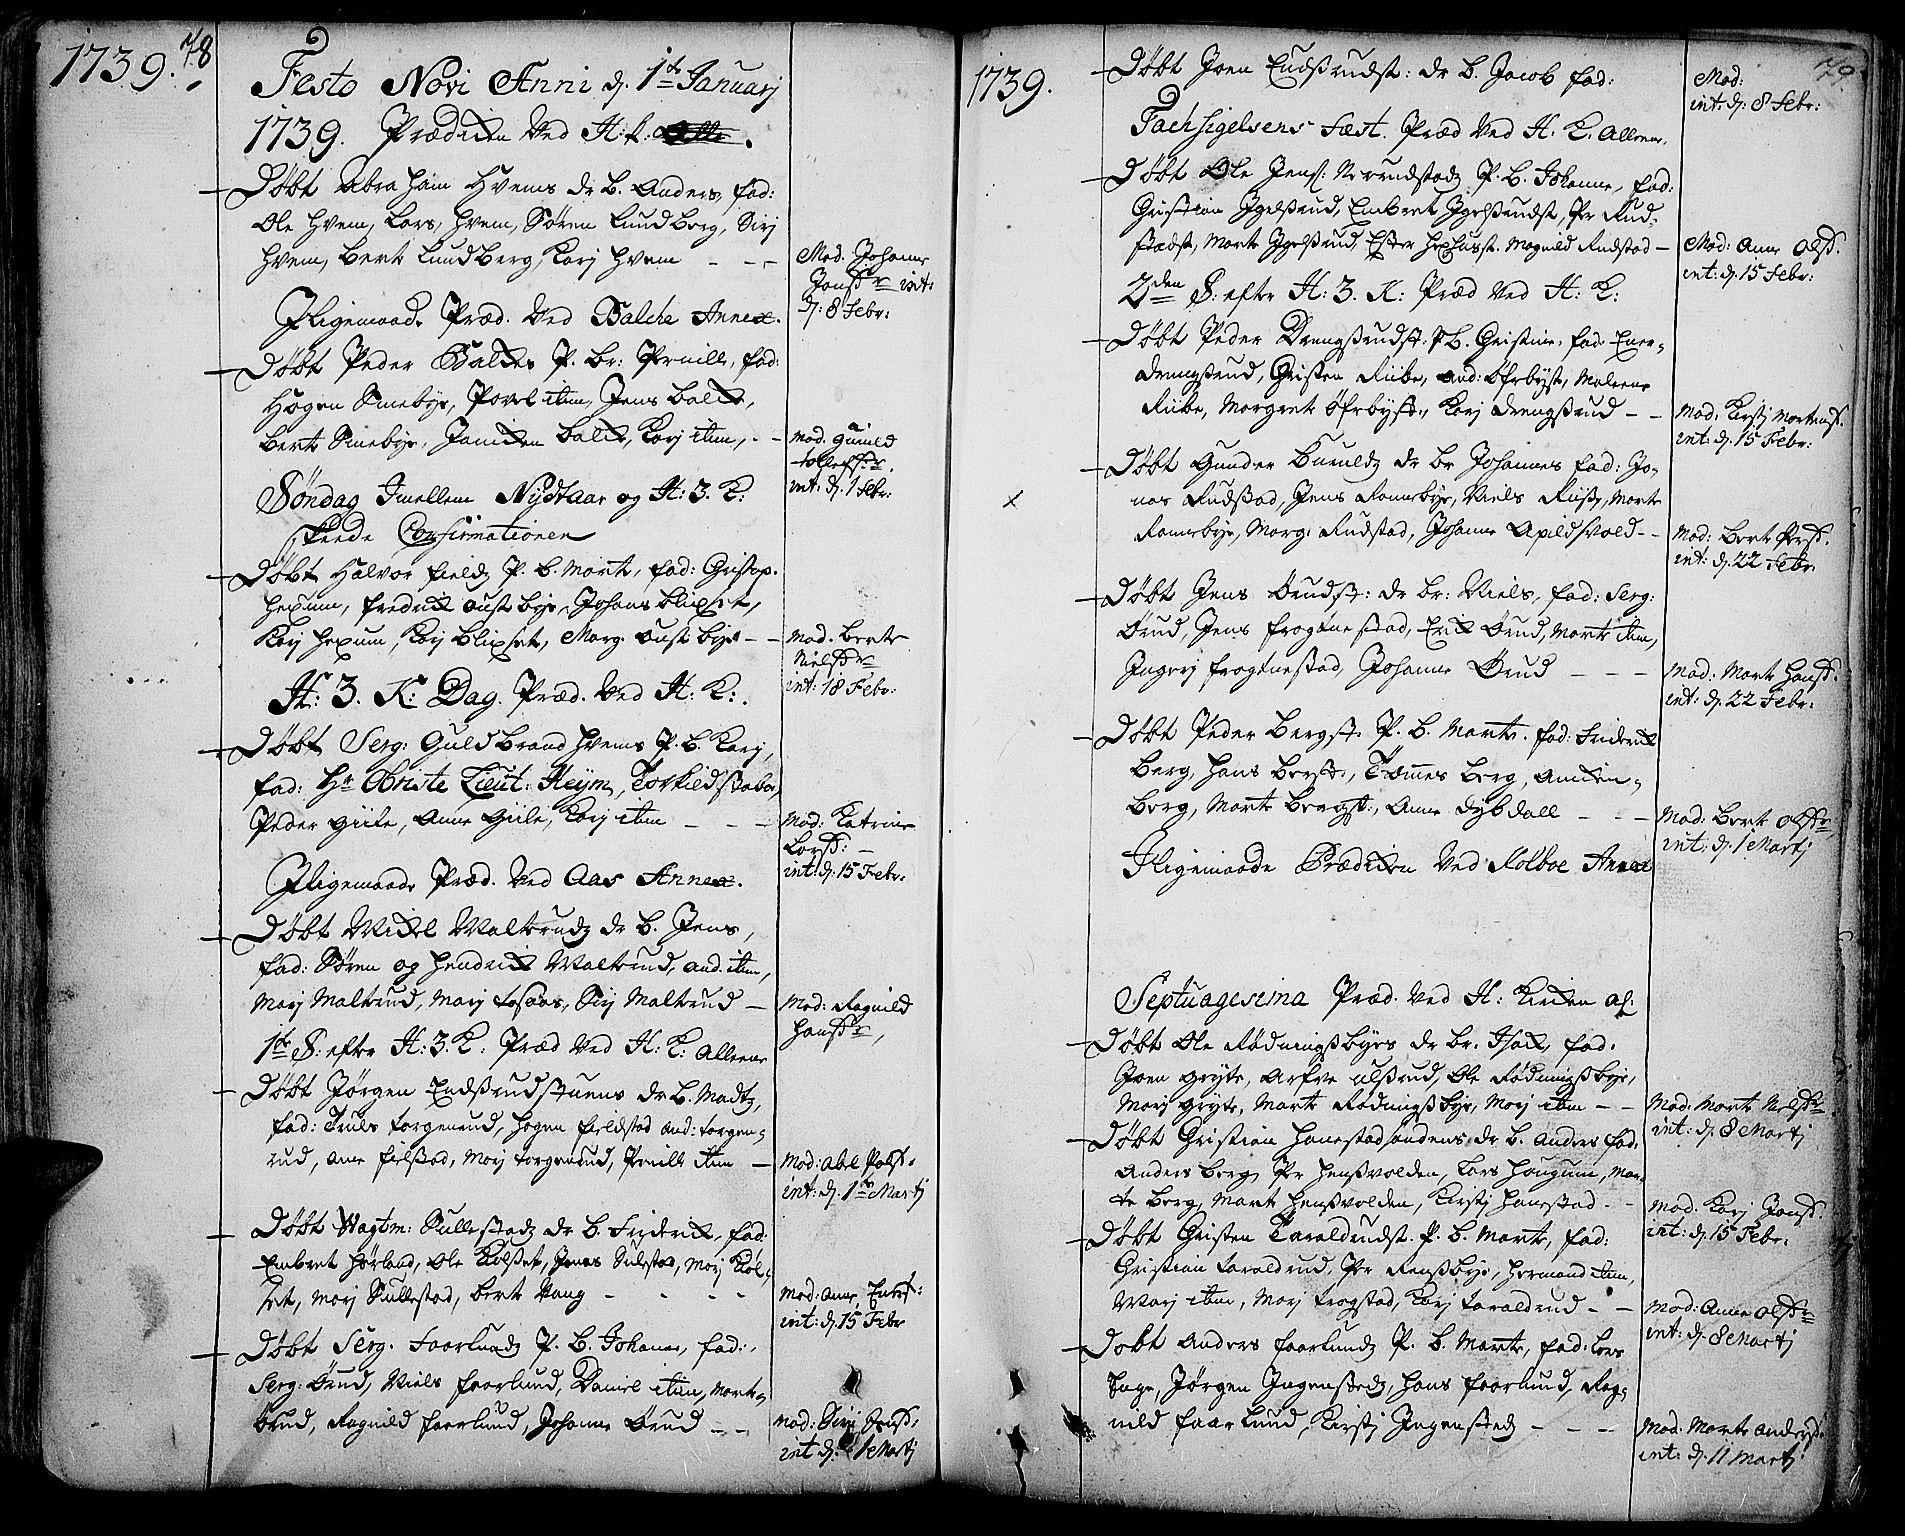 SAH, Toten prestekontor, Ministerialbok nr. 3, 1734-1751, s. 78-79